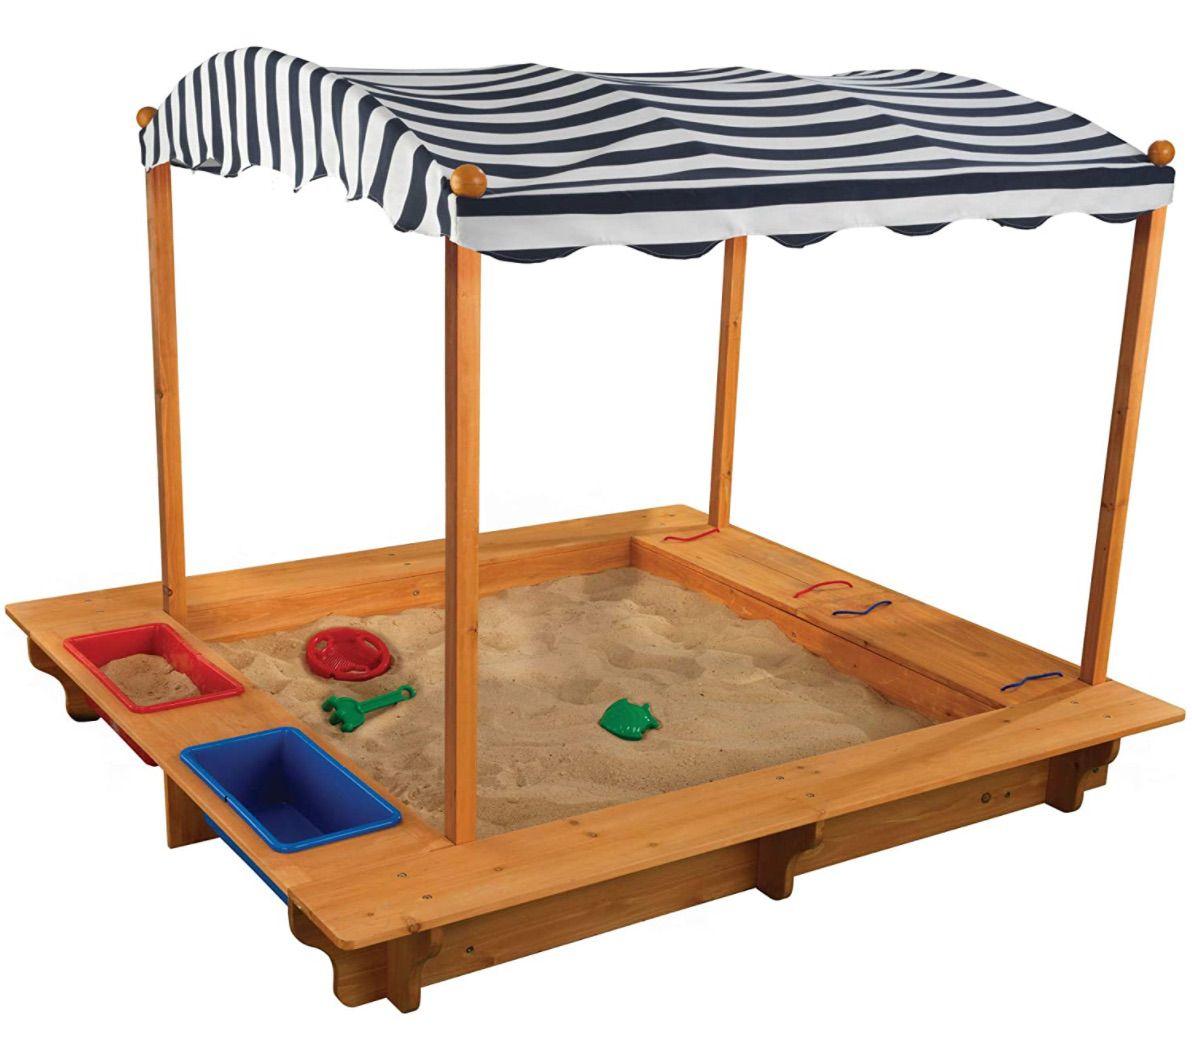 Kidcraft Activity Sandbox with Canopy